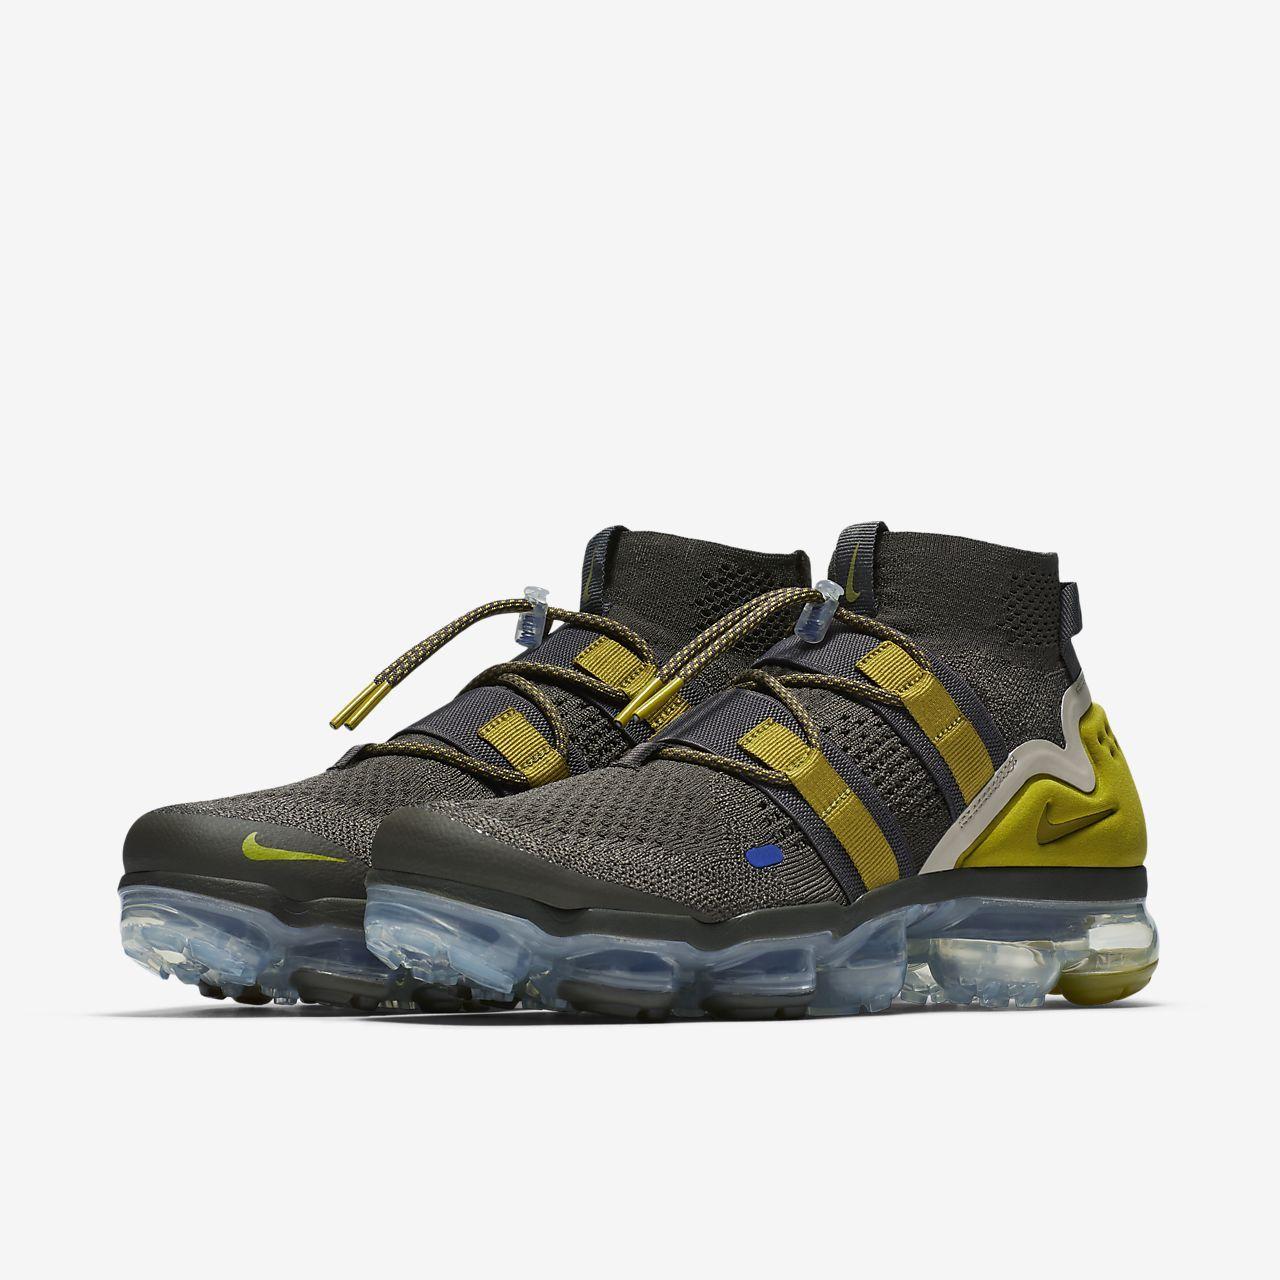 ad9ca9800d1 Nike Air VaporMax Flyknit Utility Running Shoe